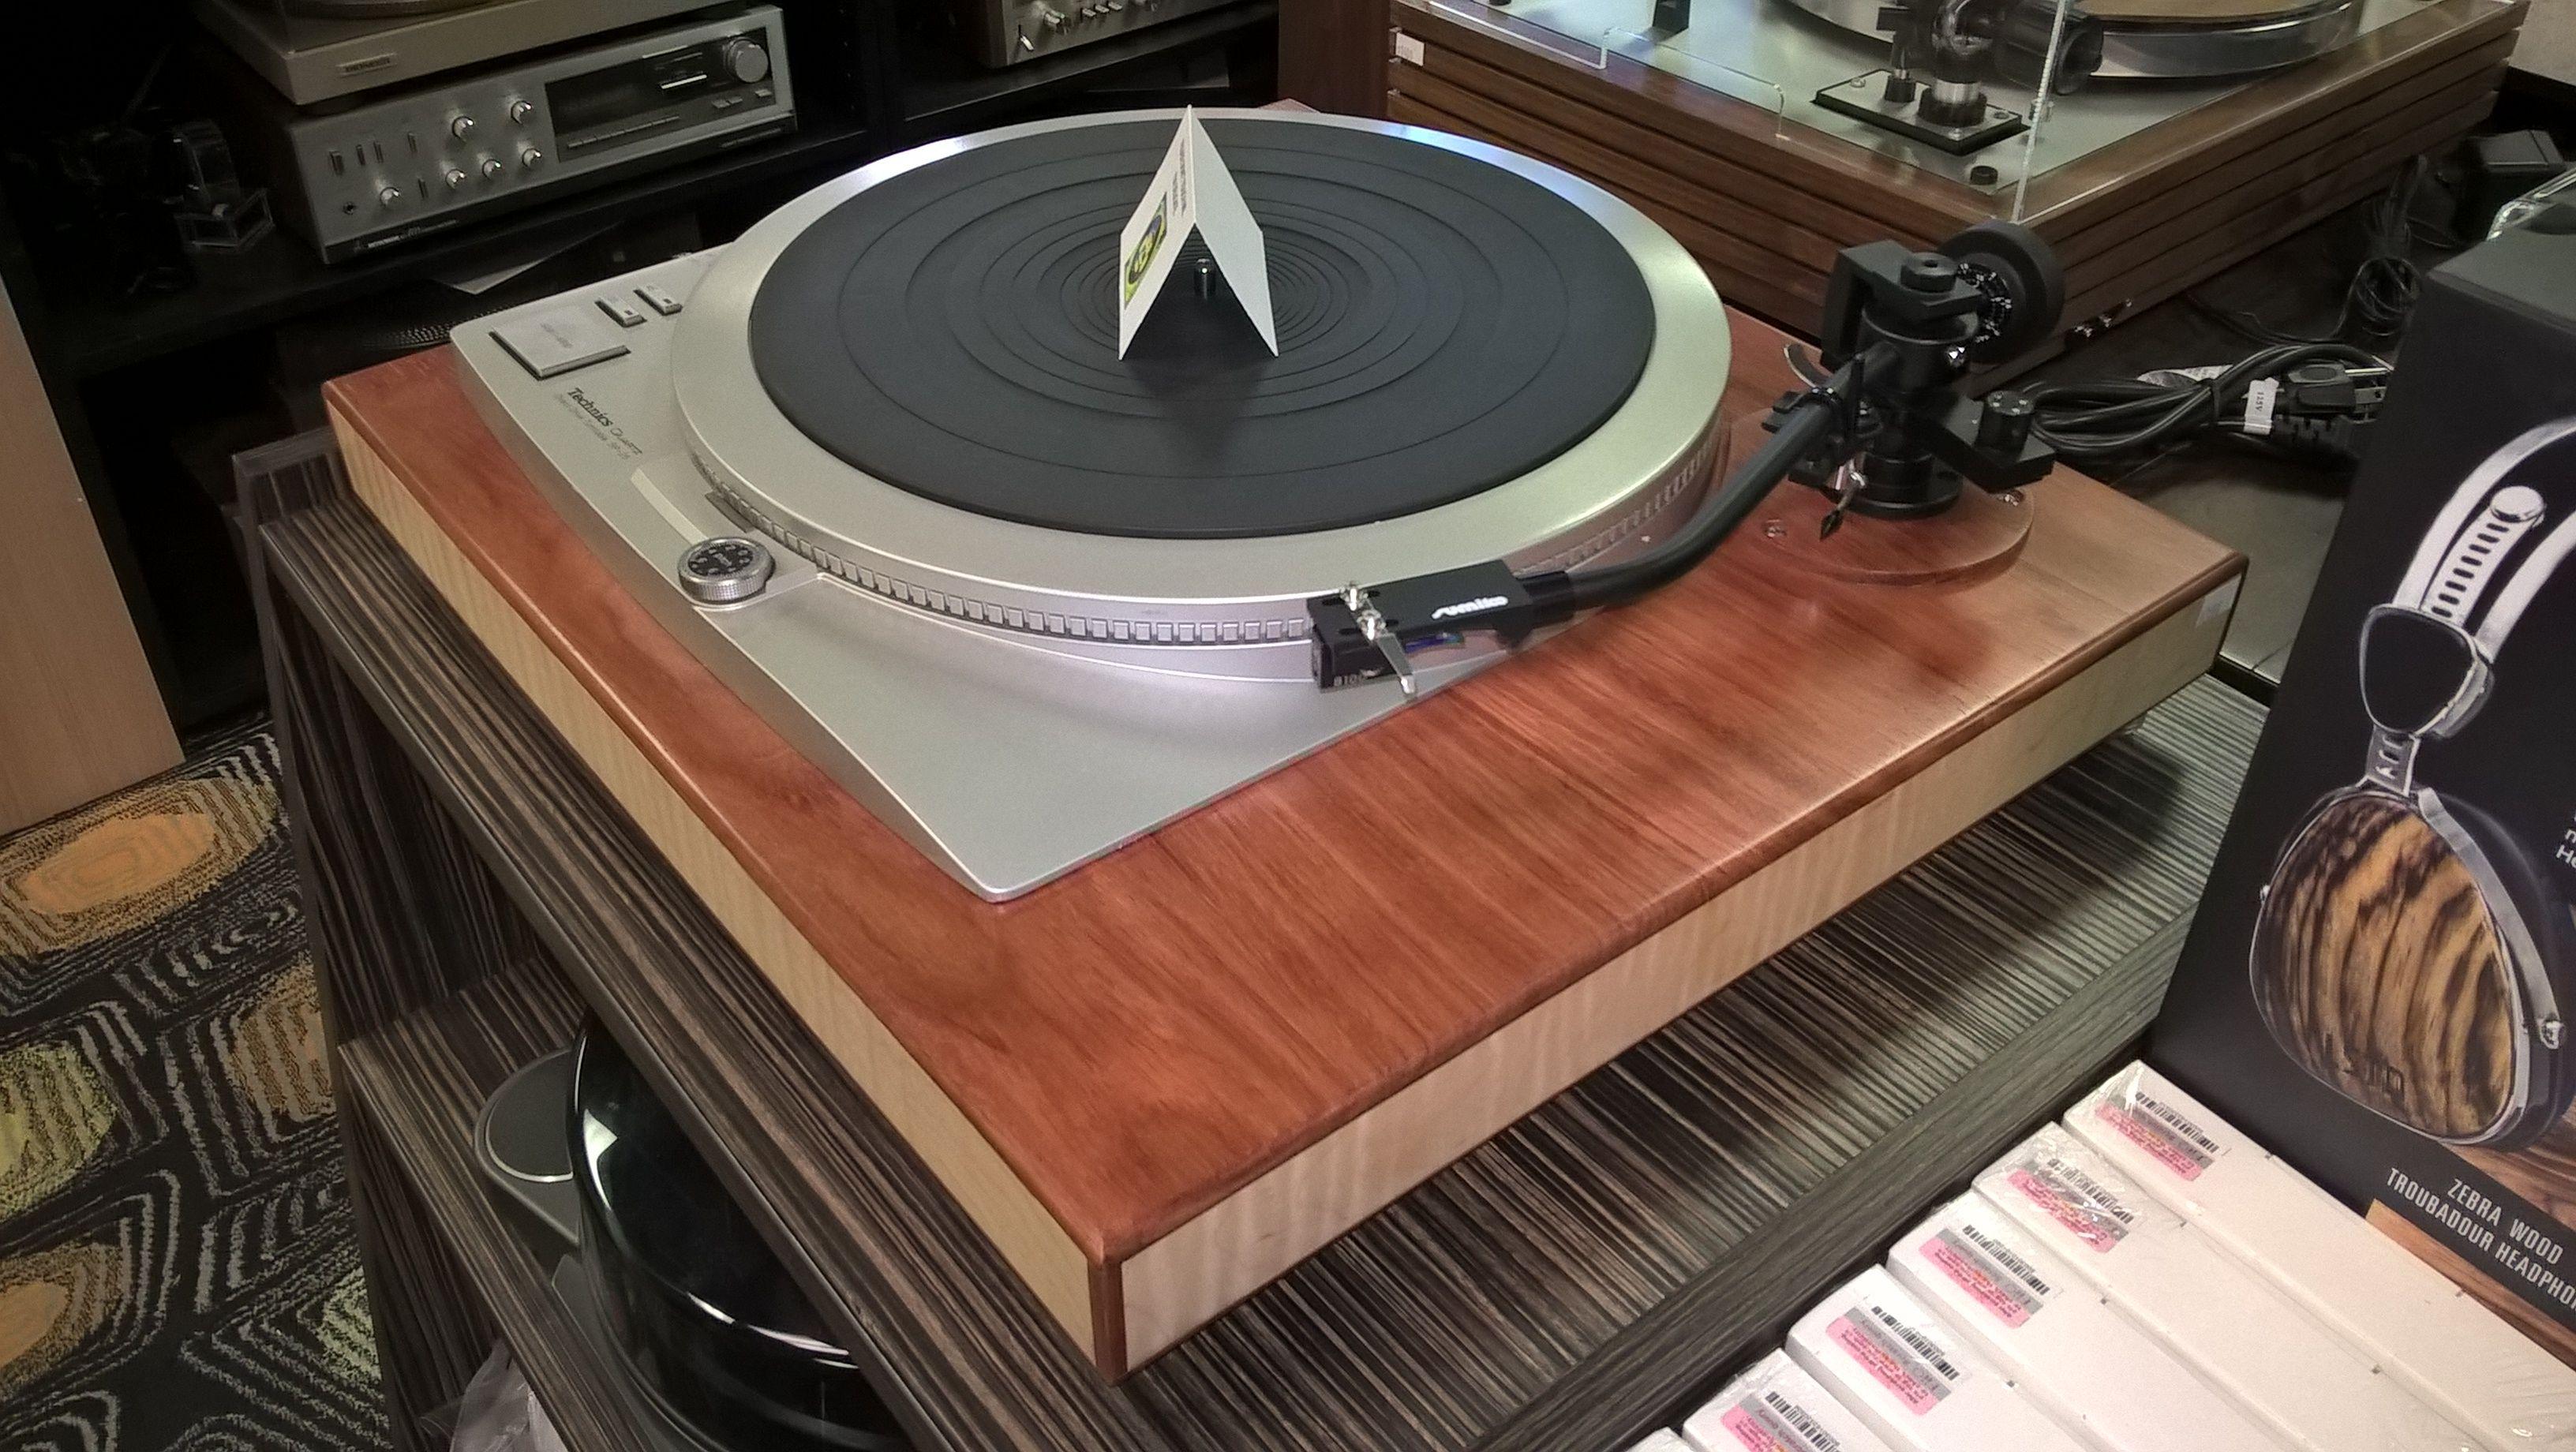 Technics Direct Drive with Sumiko Tonearm on custom base @ soundgalleryaustin.com